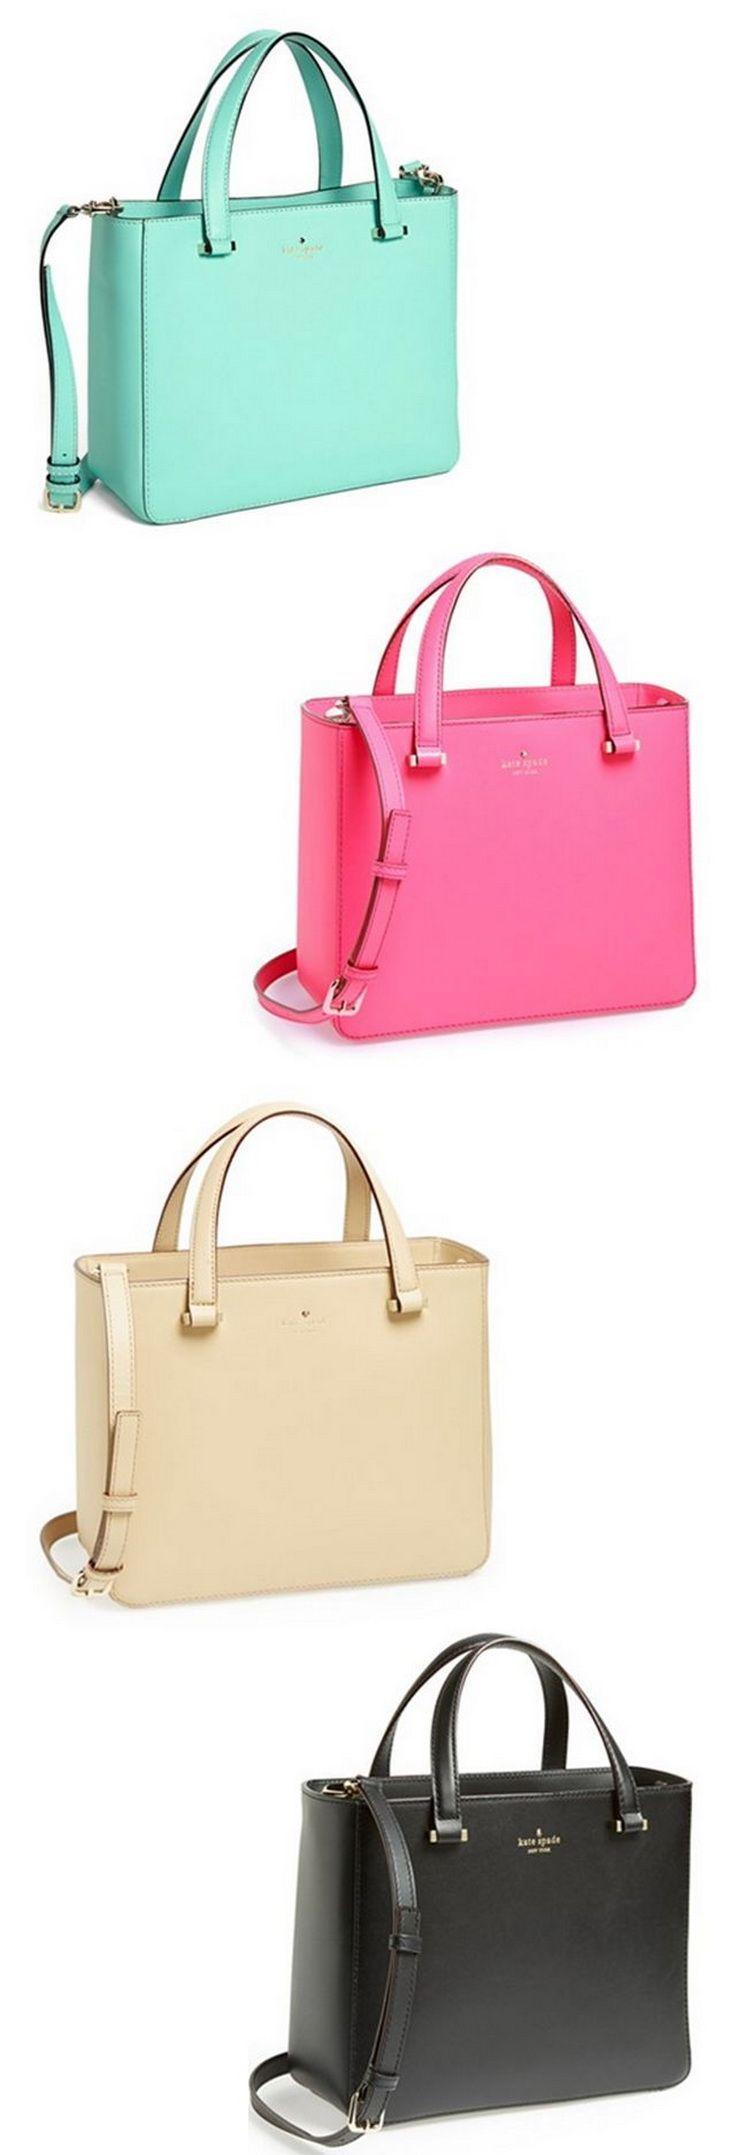 designer handbags outlet,Kate Spade Purse #Kate #Spade # ...